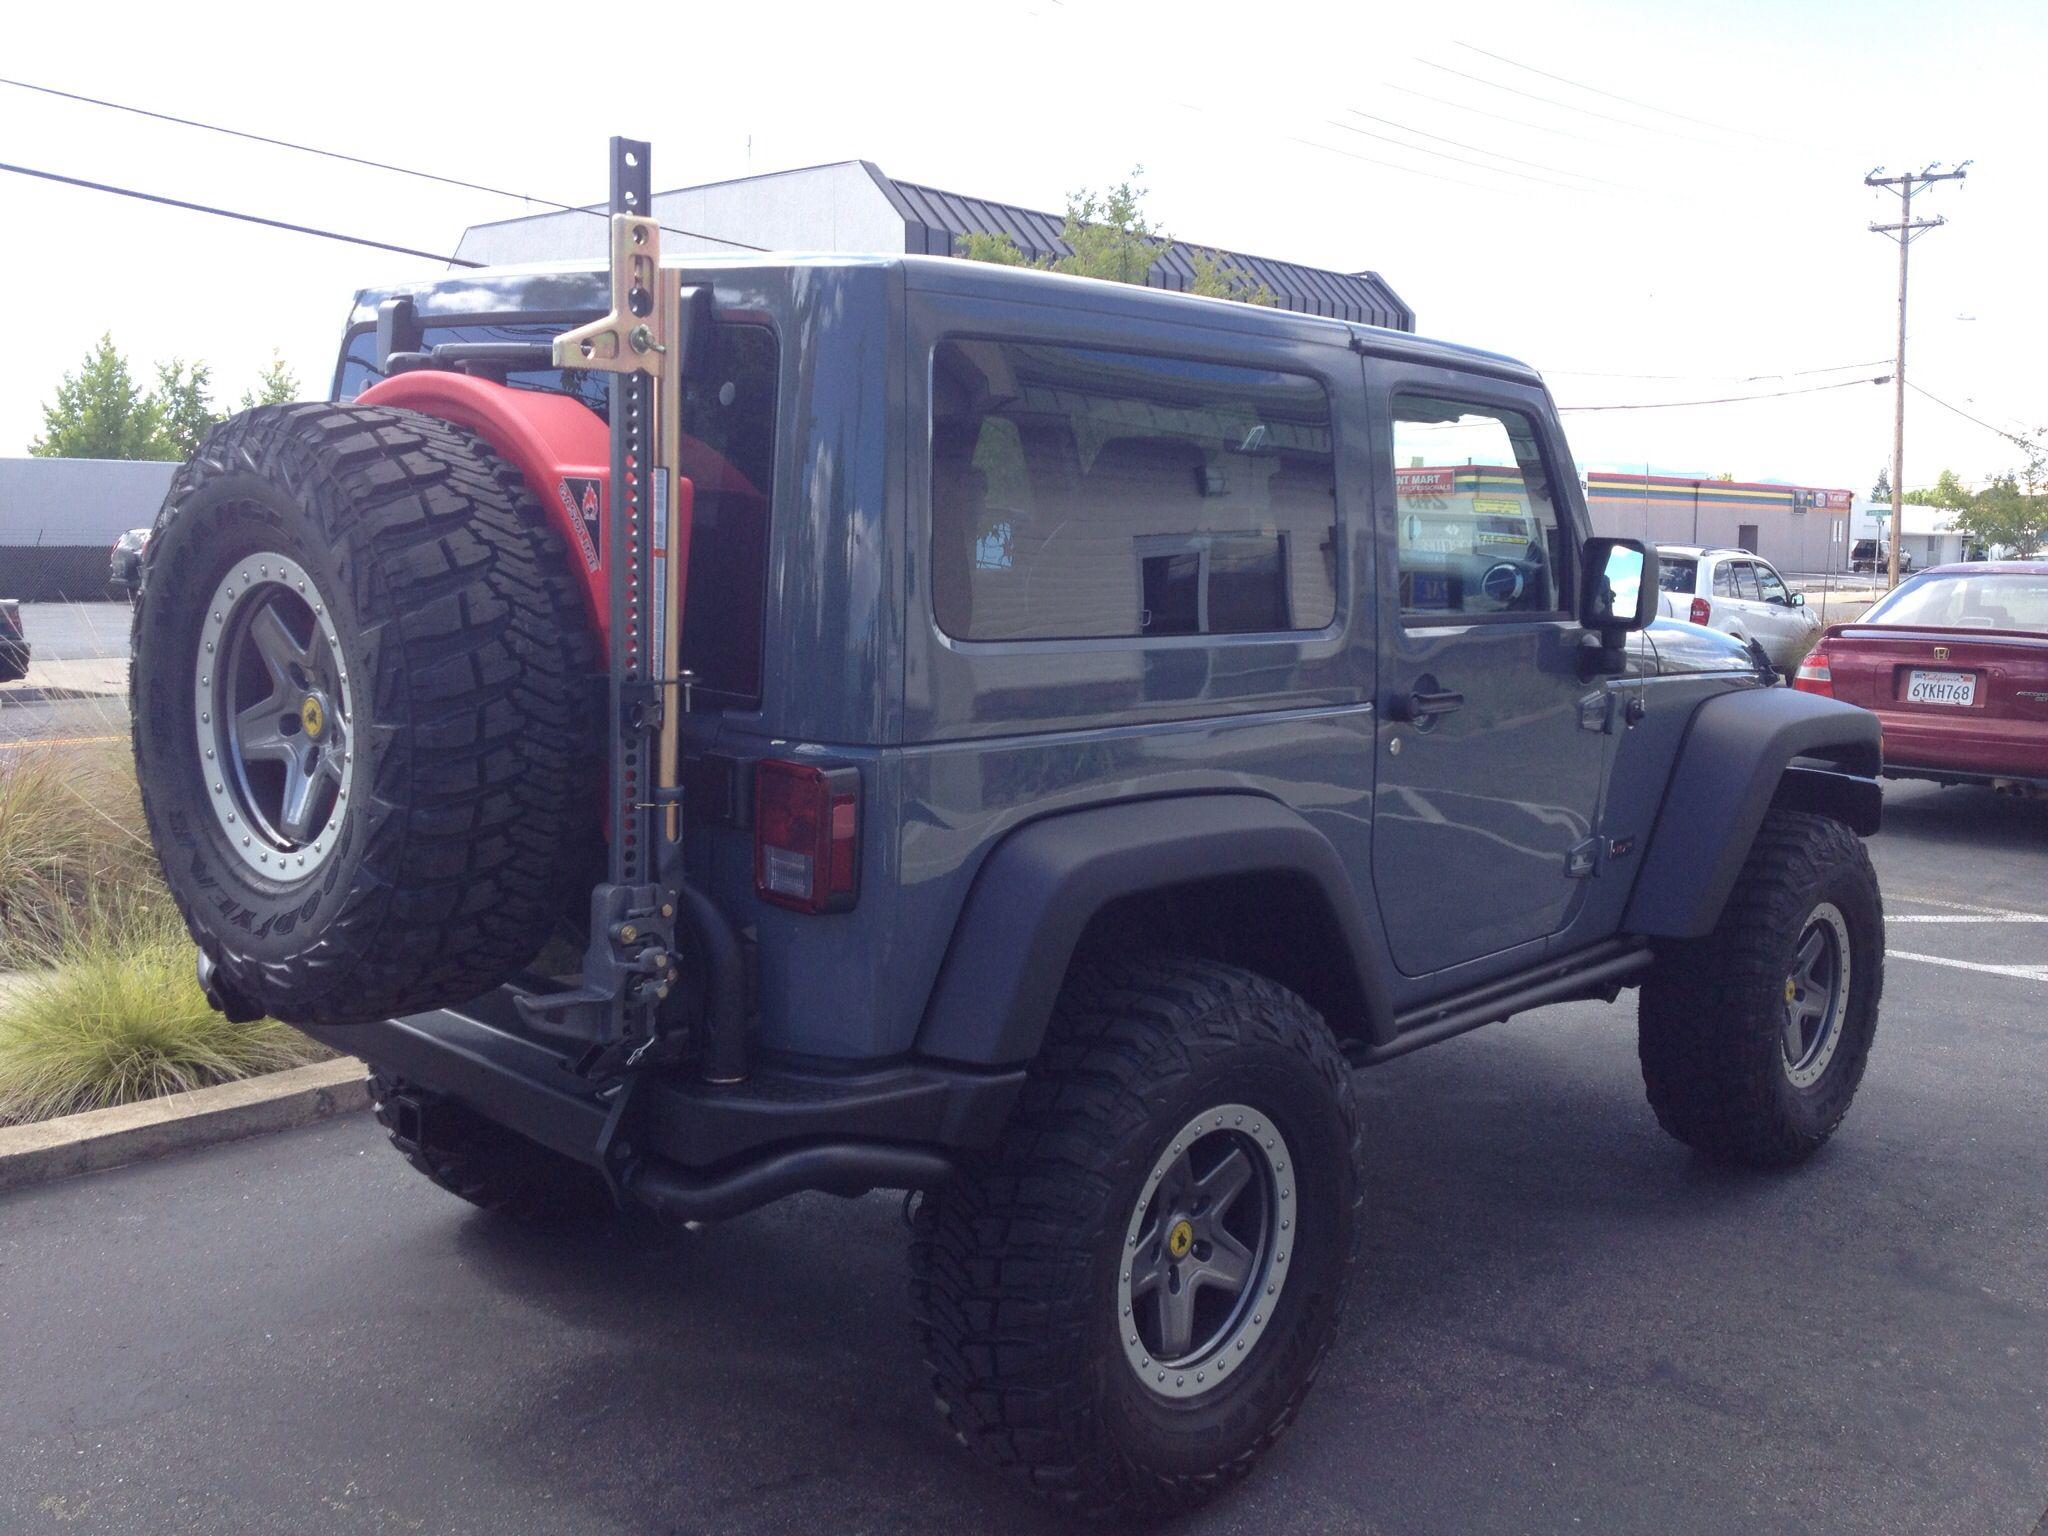 Aev tire carrier w highlift jack pull pal 10 gallon gas tank